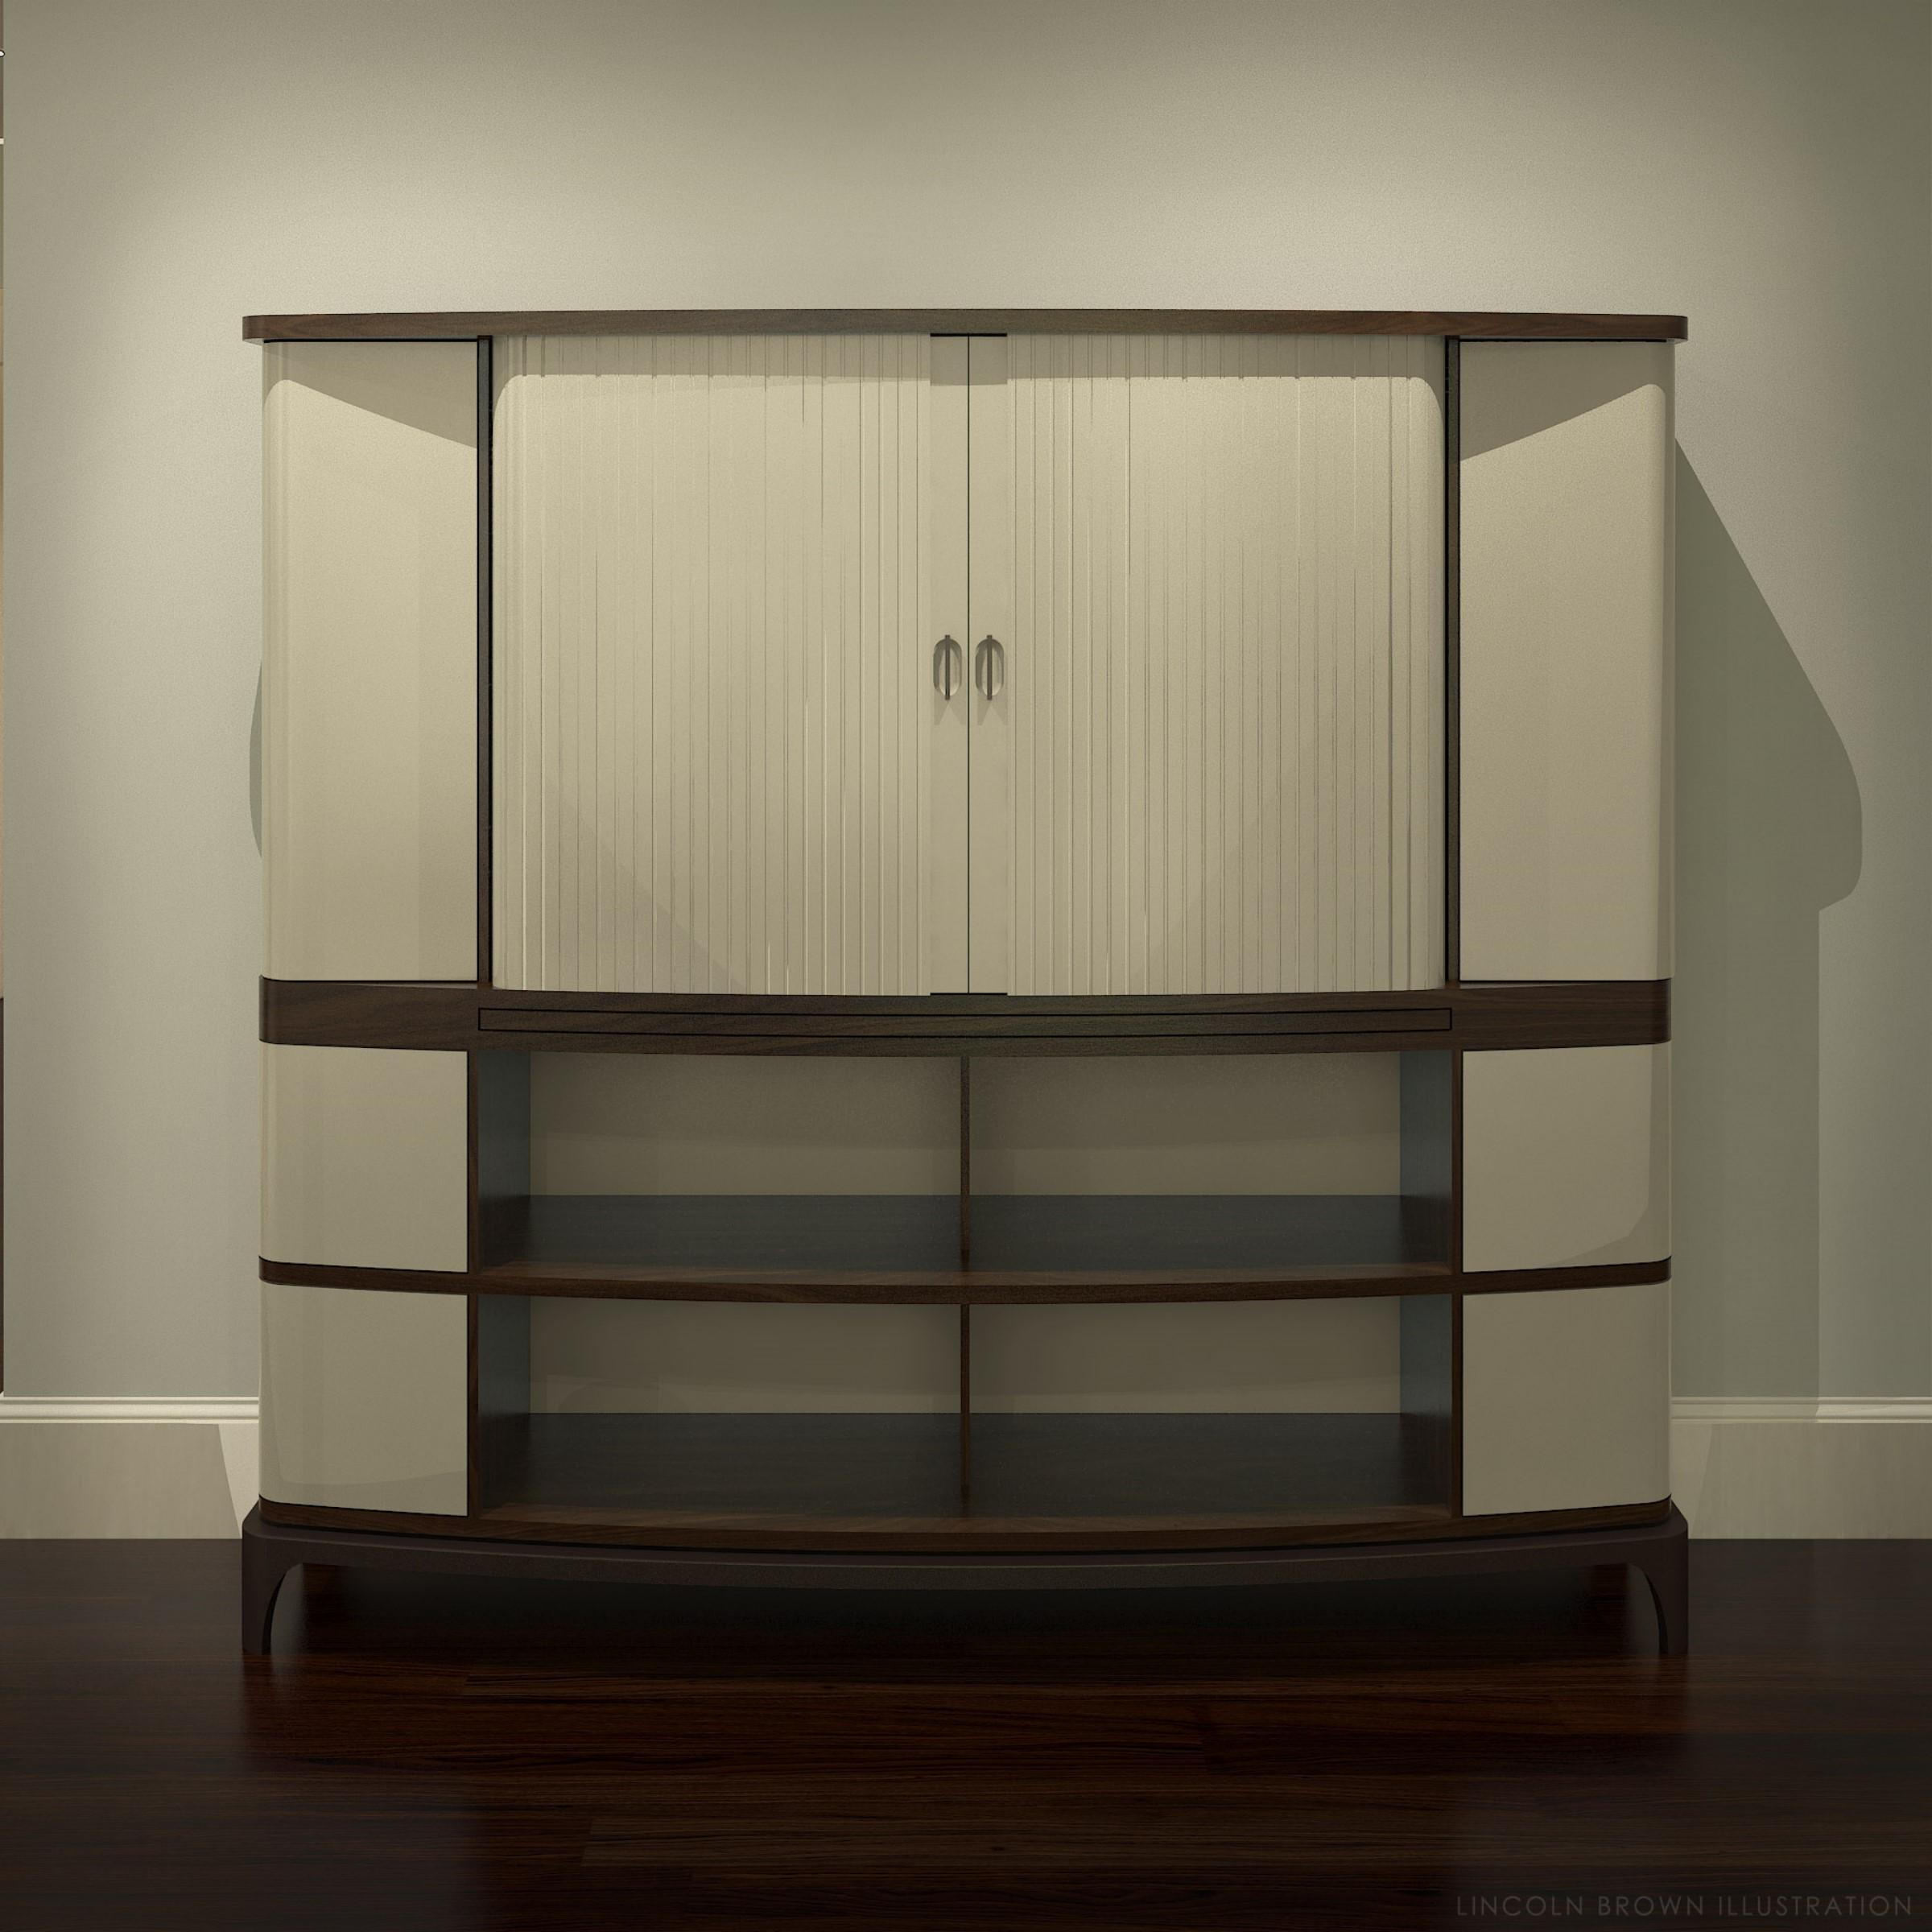 2016-08 Abramson Weston - Cabinet02 closed c03.jpg